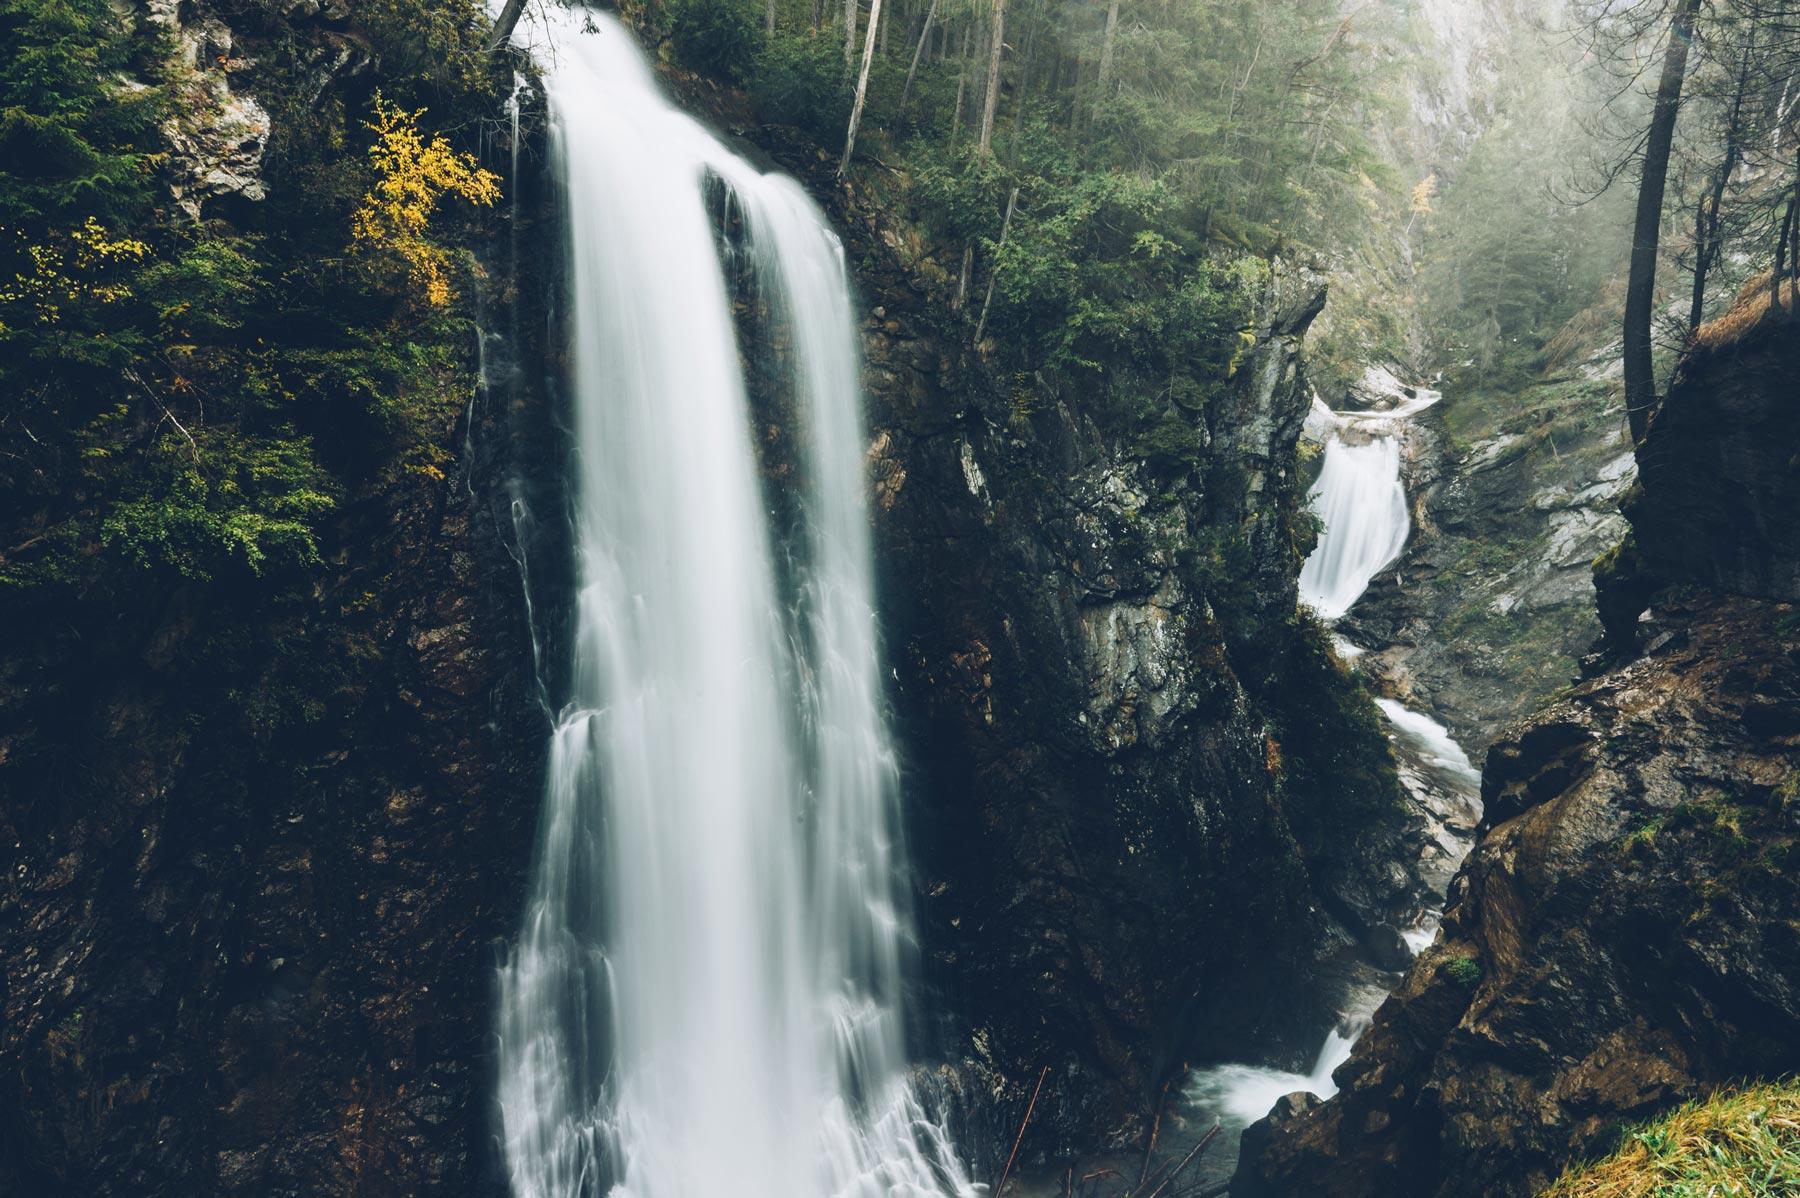 Cascades Riva, Dolomites